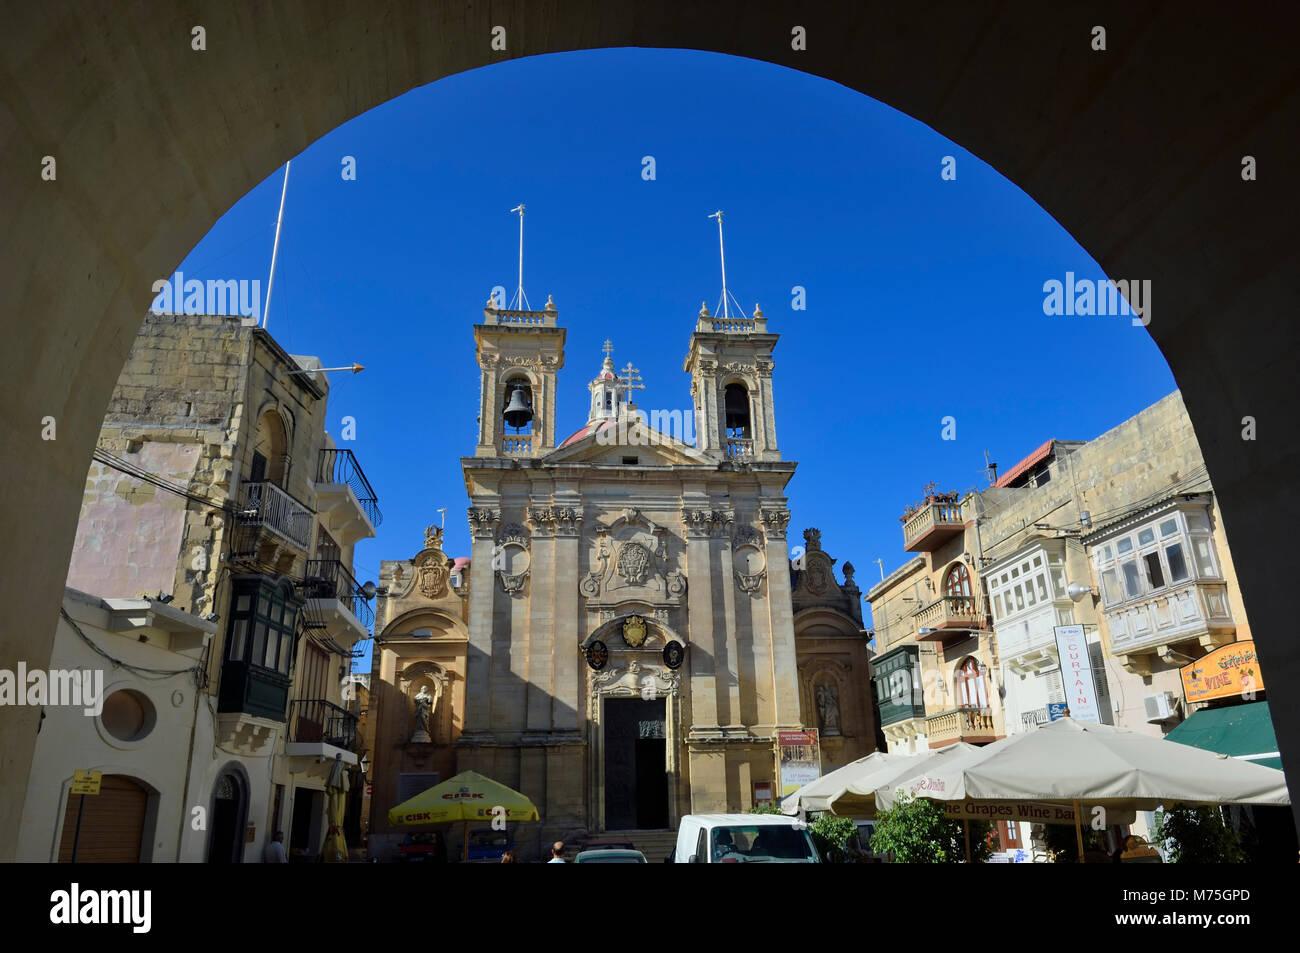 St George's Basilica, St Georges square, Victoria, Gozo, Malta - Stock Image